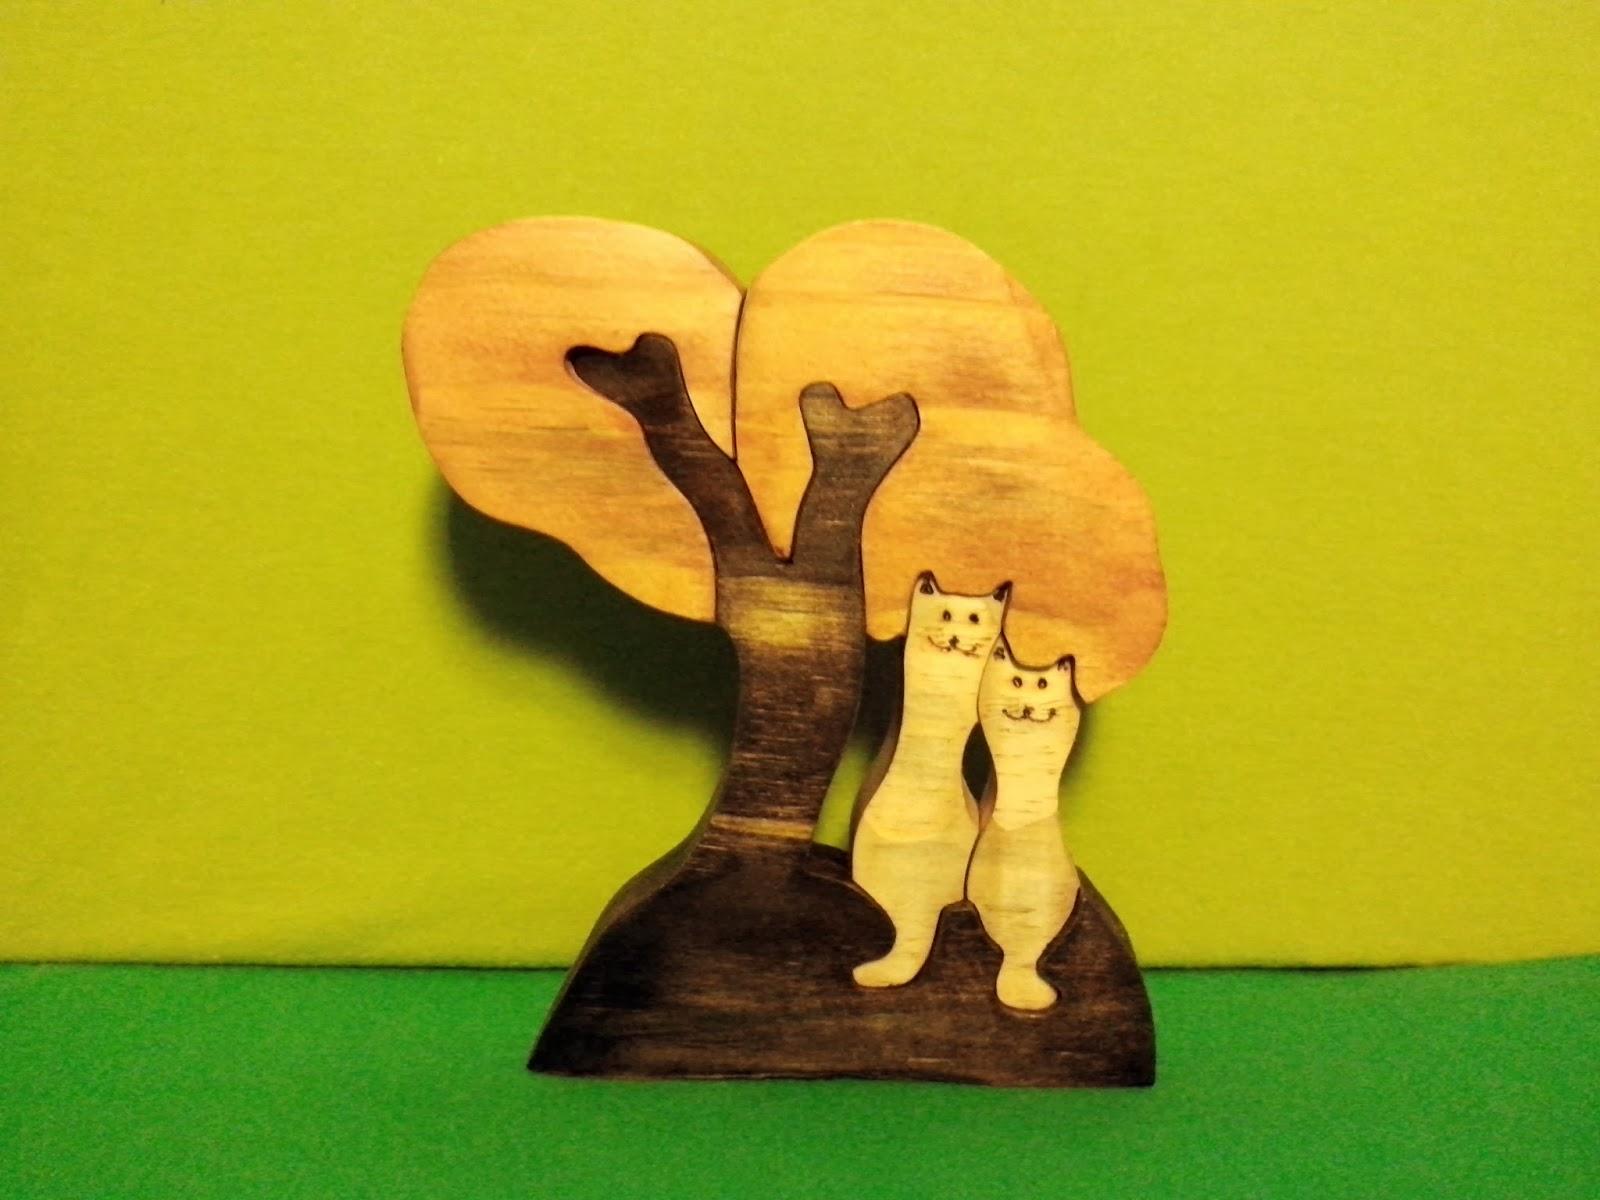 madeira artesanato brasilia daniel visconti